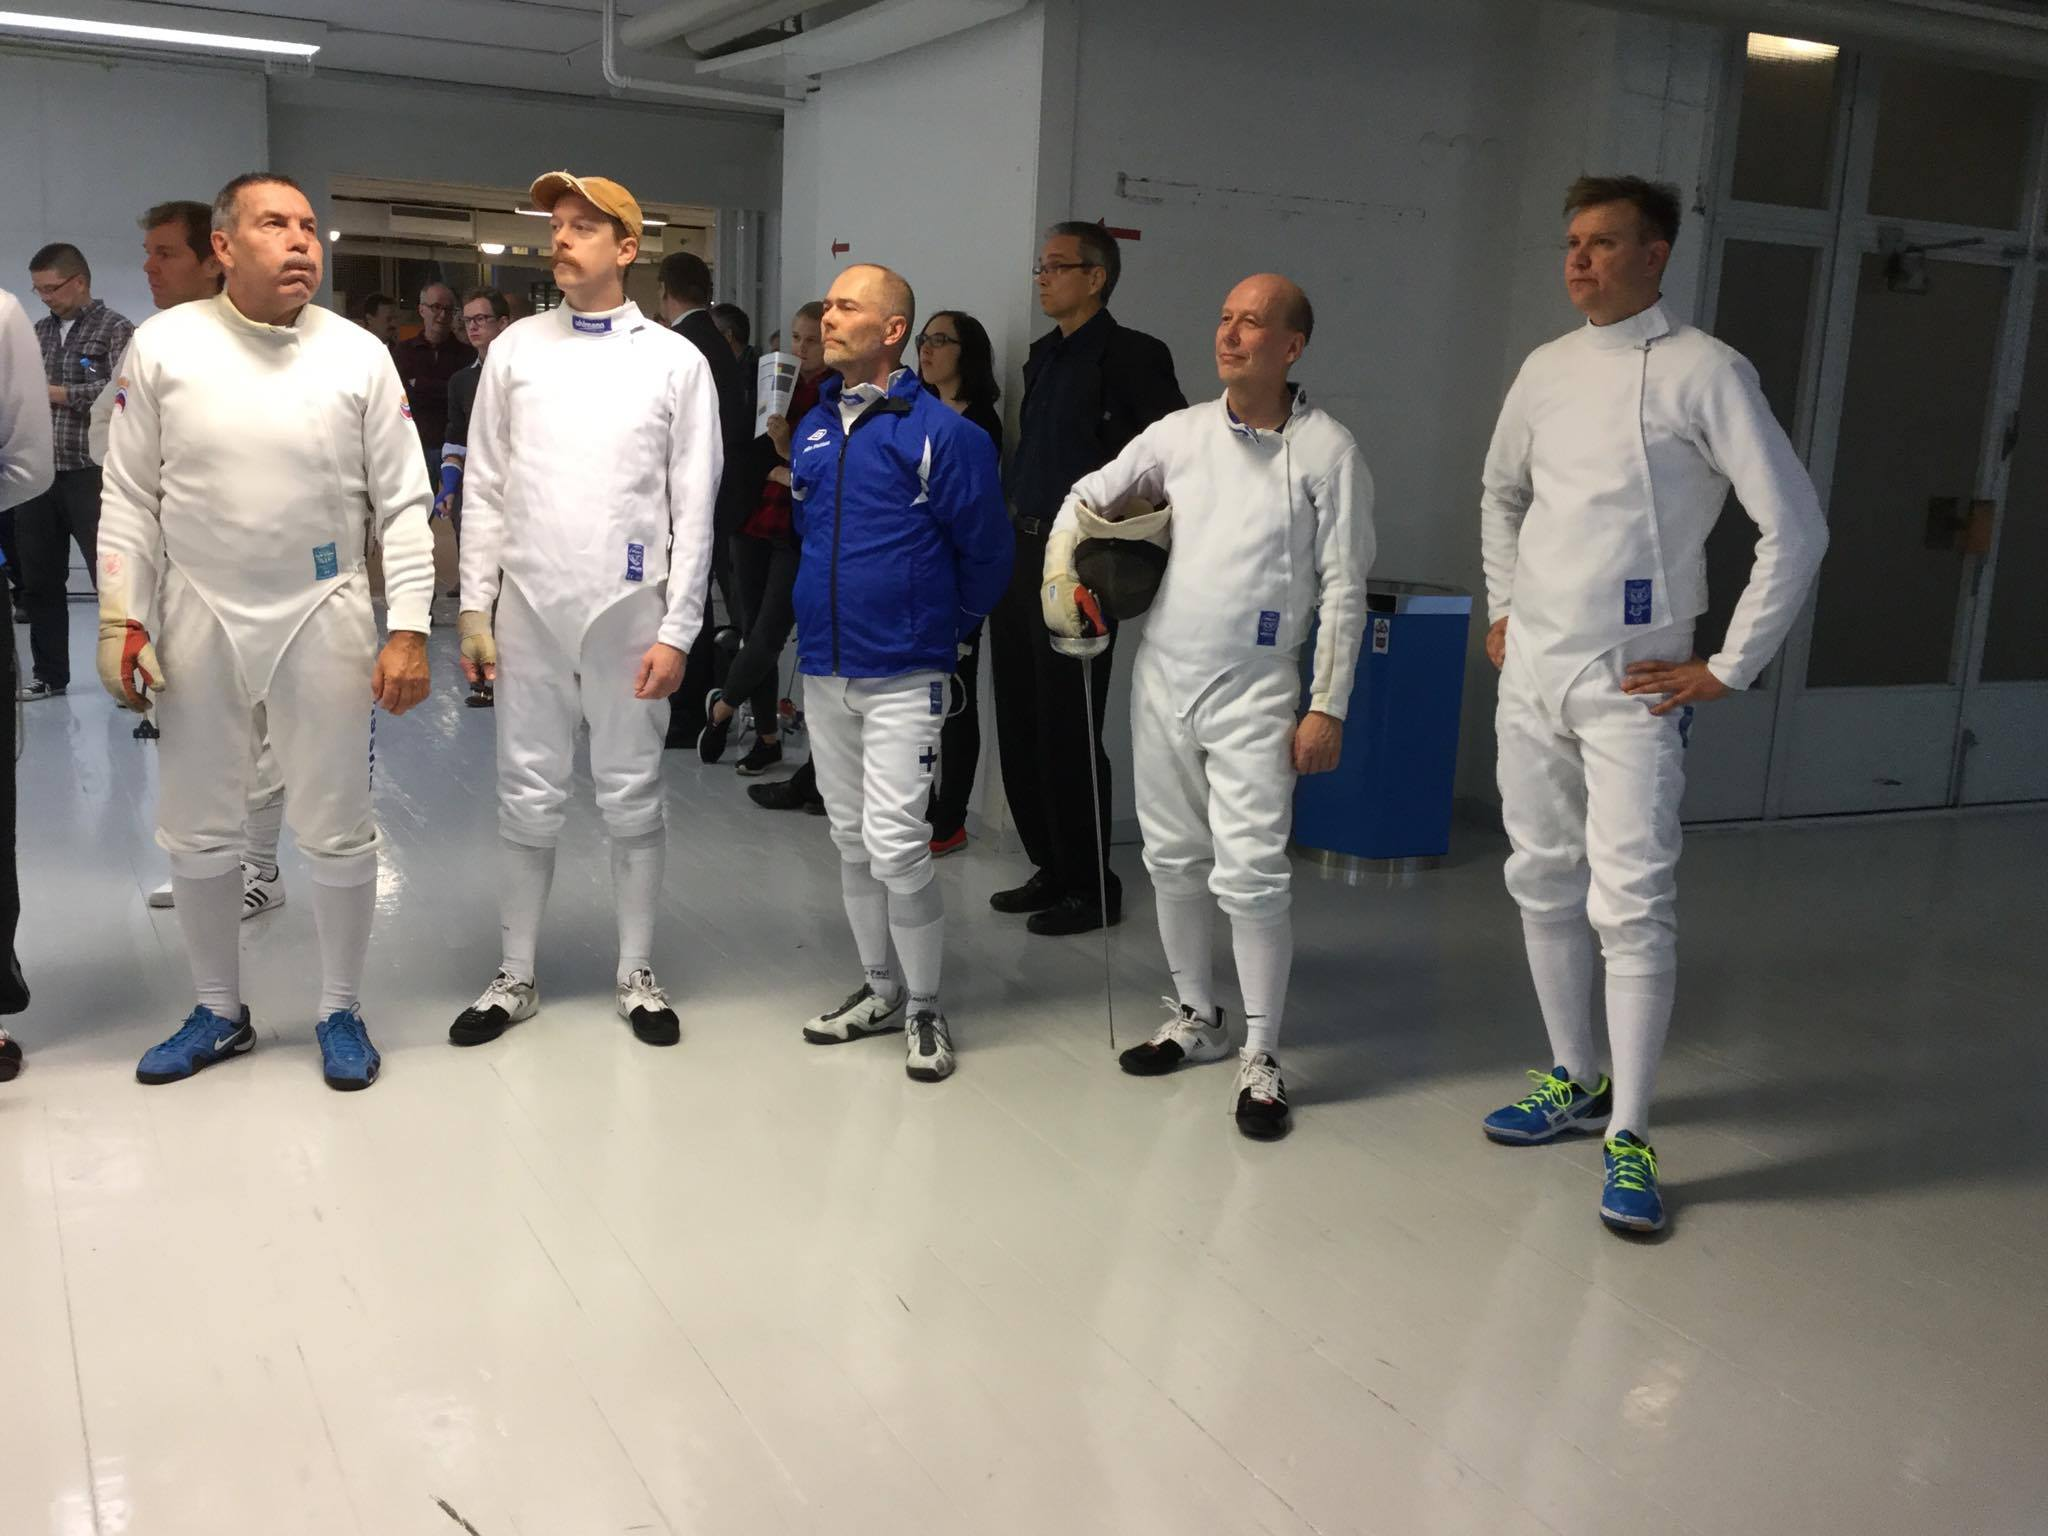 Helsingin Miekkailijat